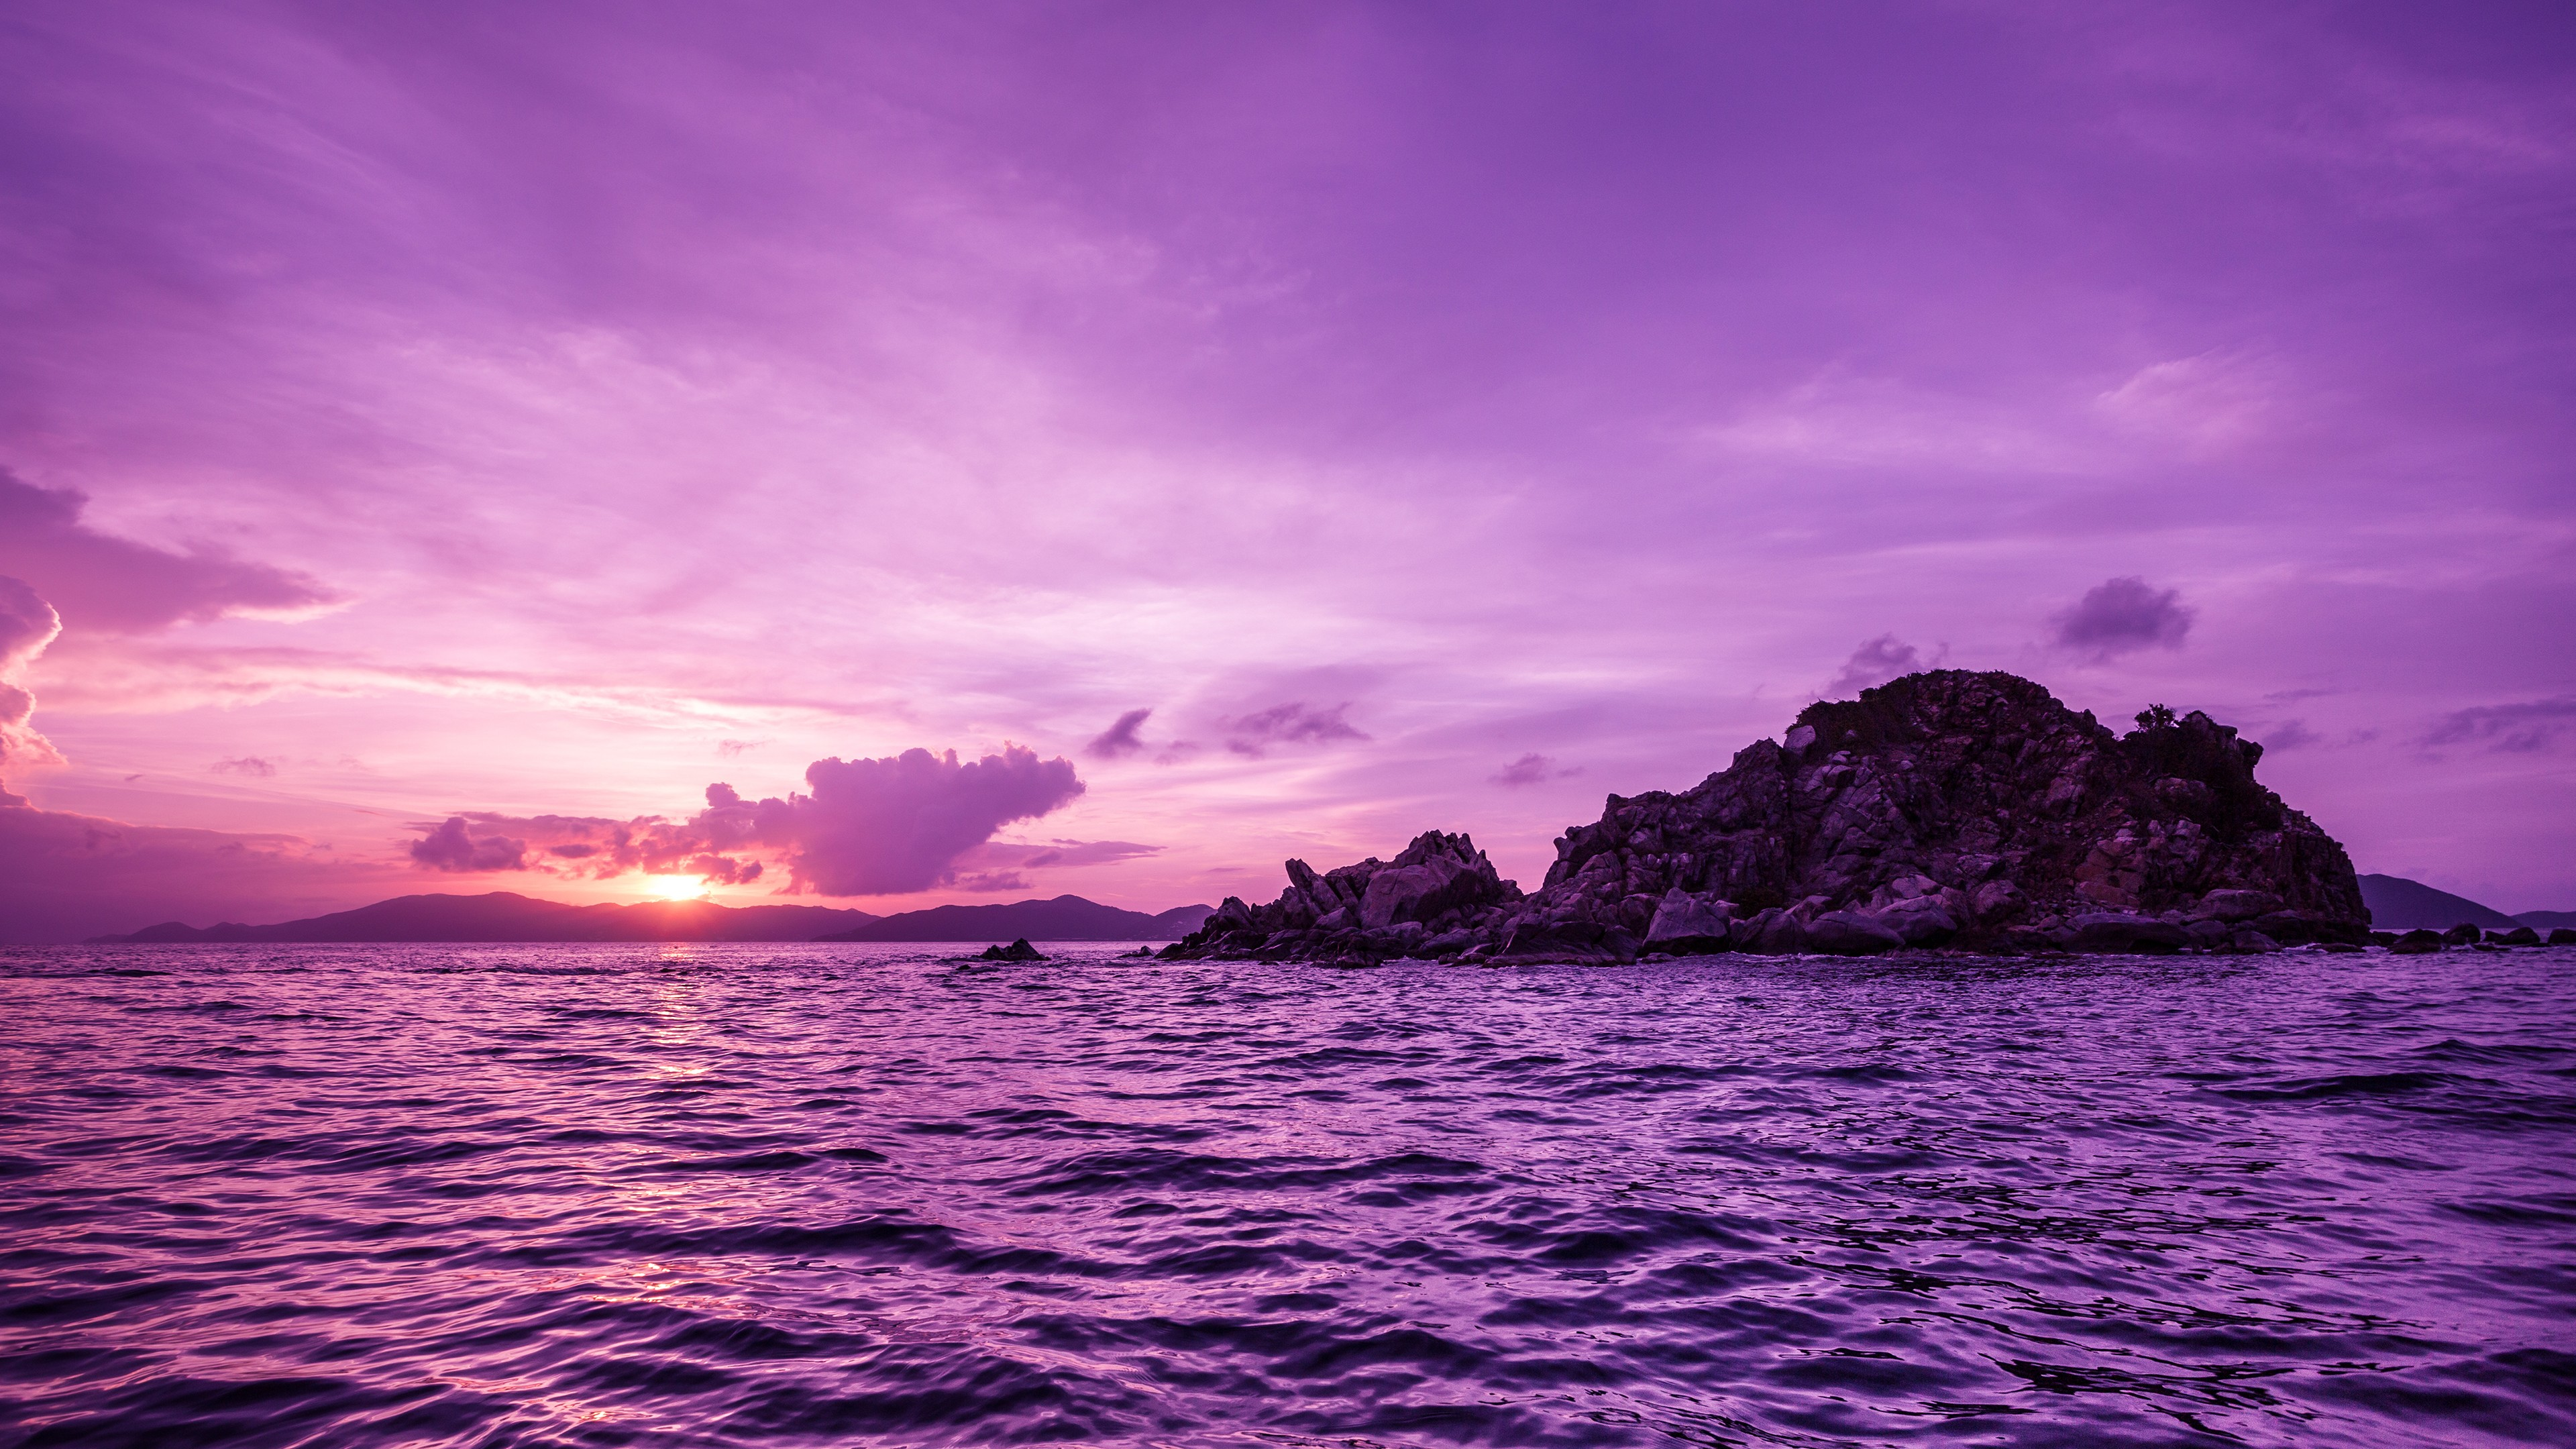 Available Desktop Resolutions Purple Sunset 4k 266131 Hd Wallpaper Backgrounds Download